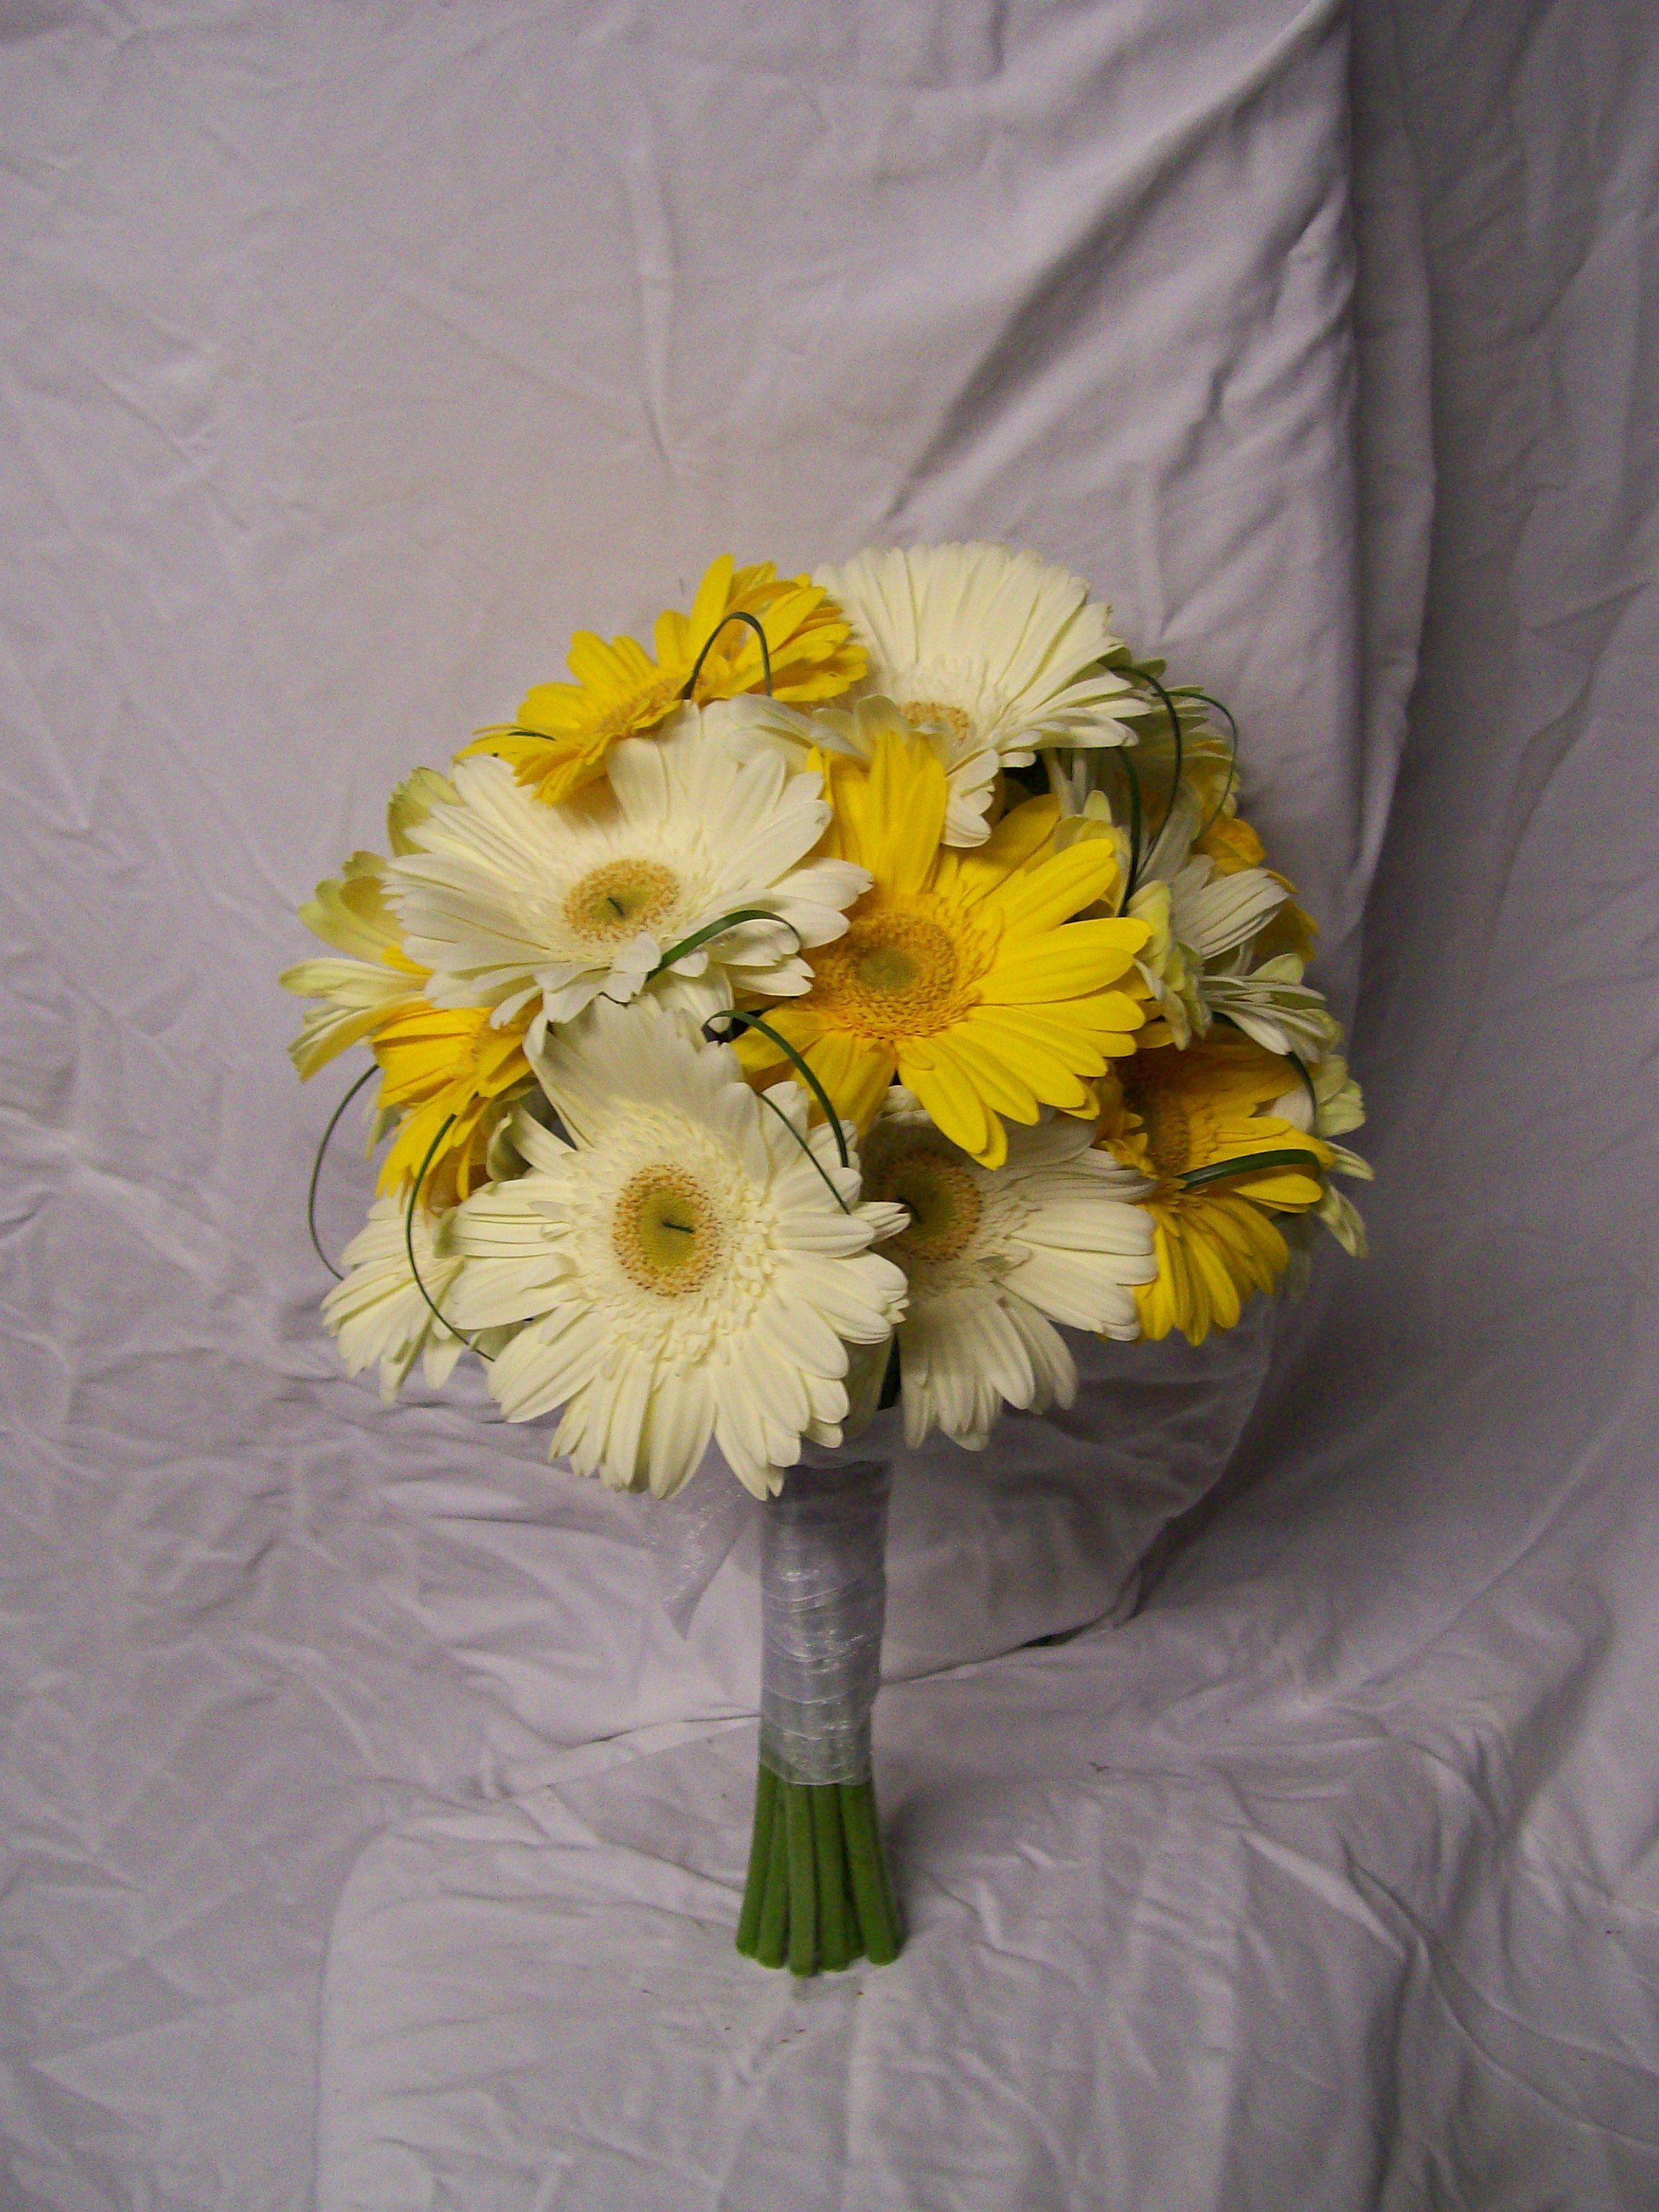 Yellow gerber daisy wedding bouquets powell white and yellow yellow gerber daisy wedding bouquets powell white and yellow gerbera daisy bouquetcarrie anne powell izmirmasajfo